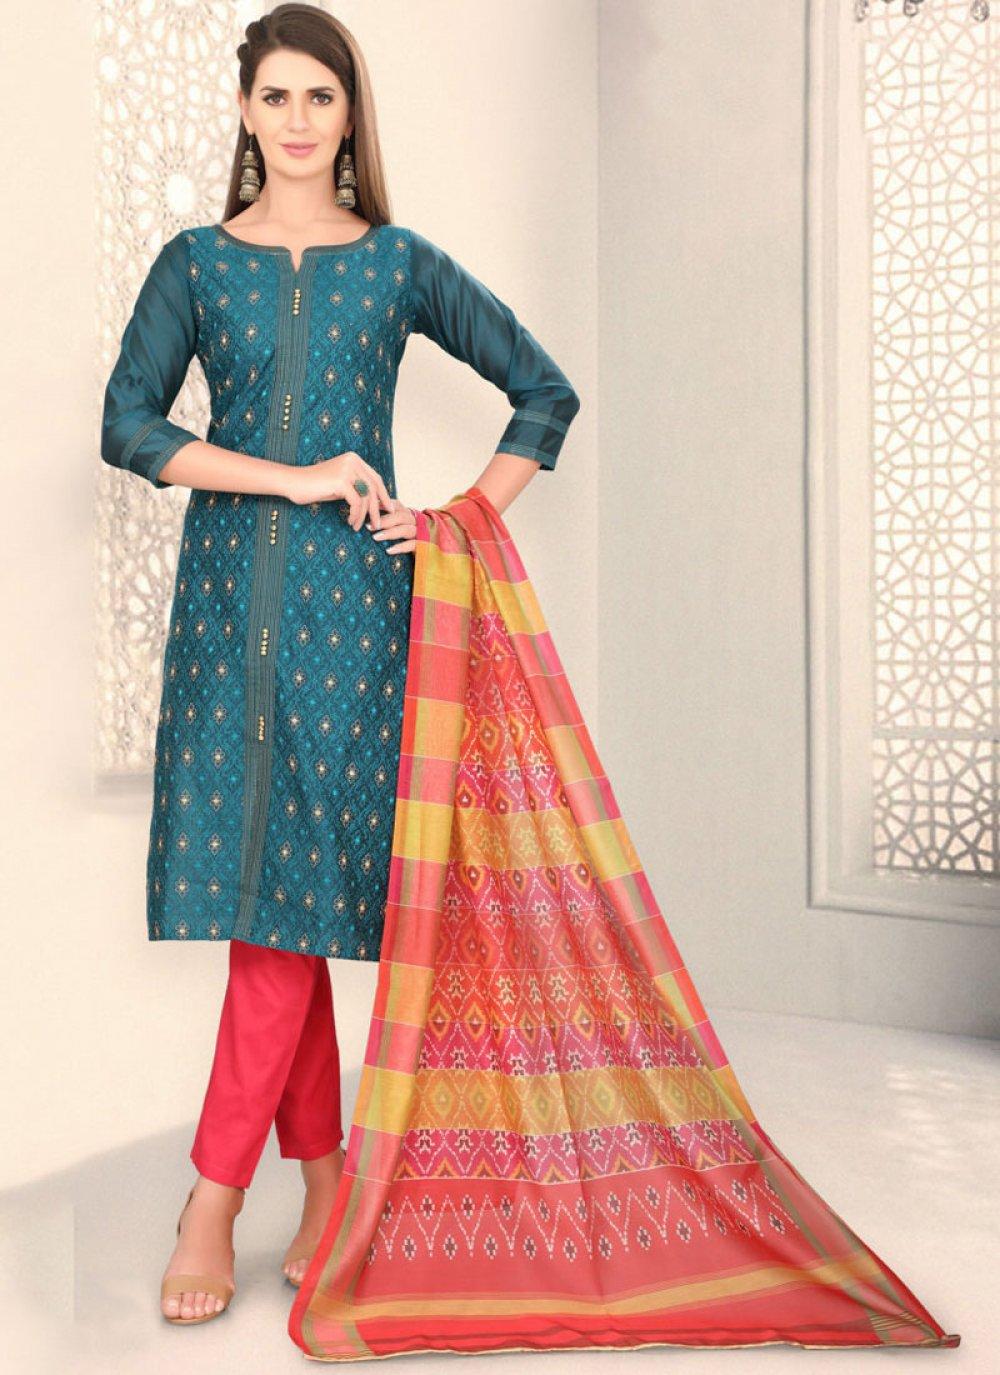 Chanderi Churidar Designer Suit in Teal